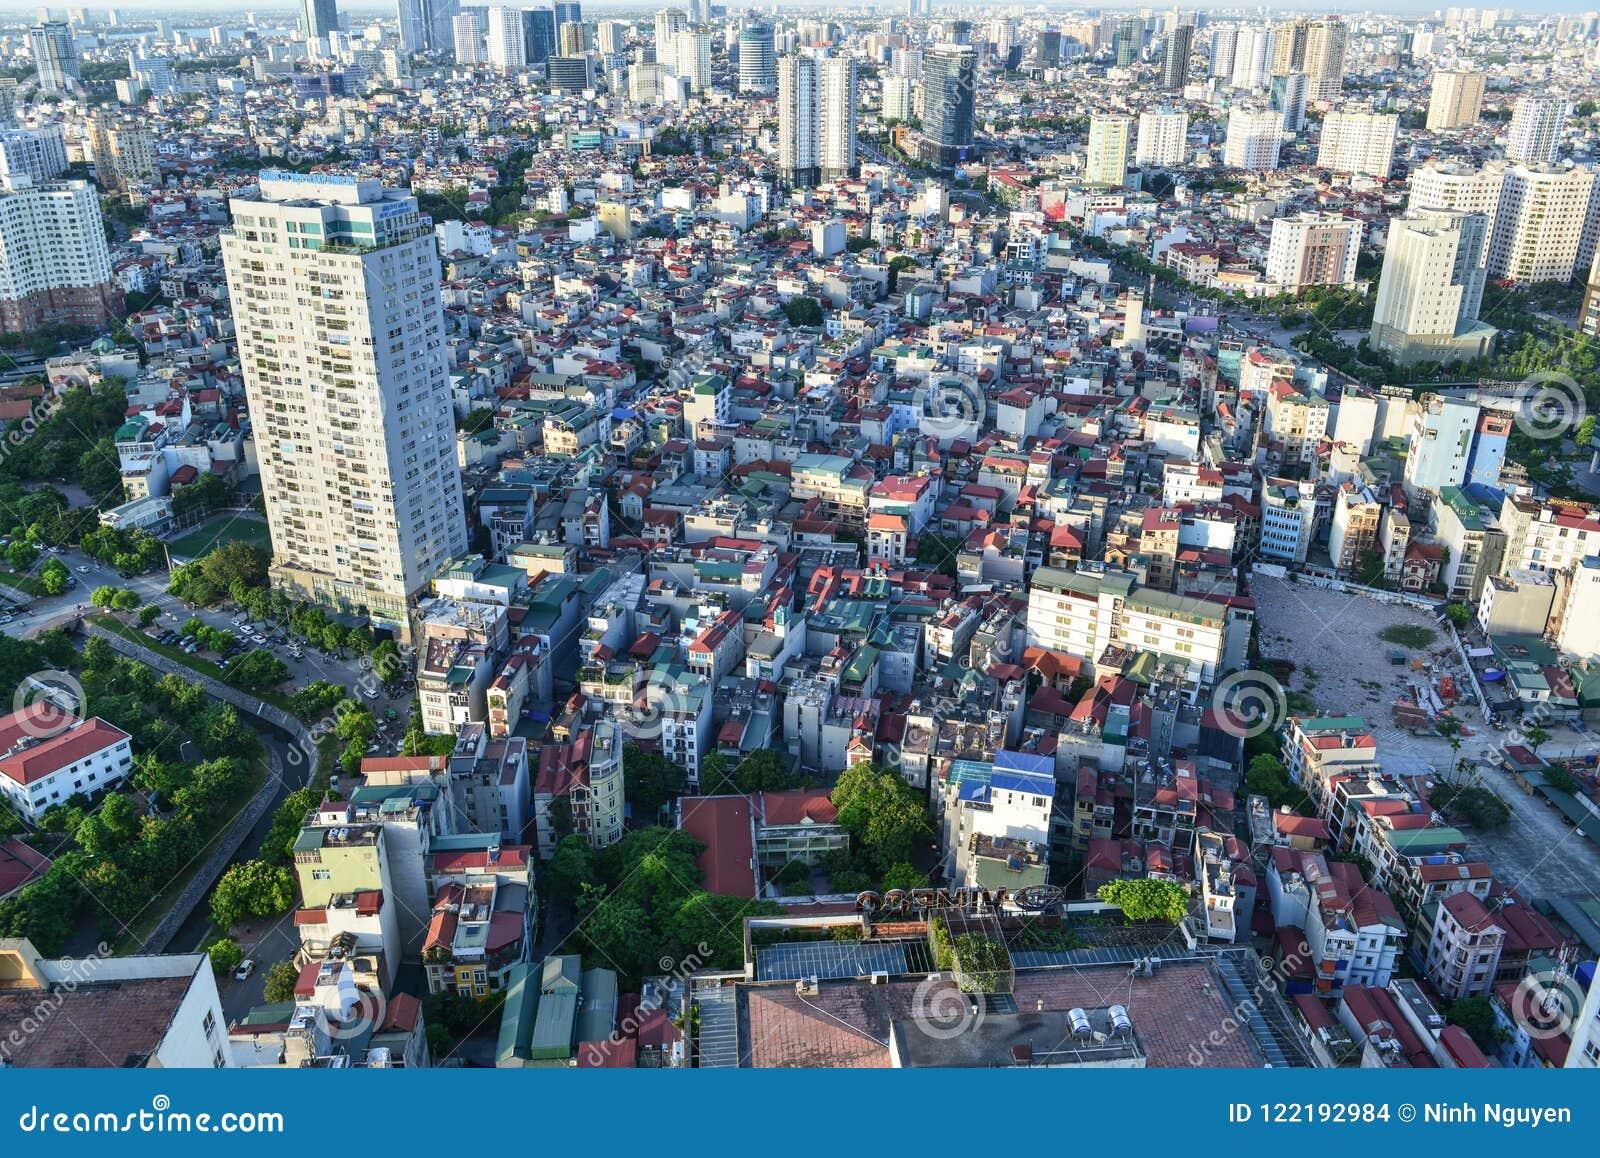 Hanoi Views From Above, Hanoi City, Vietnam Stock Photo - Image of